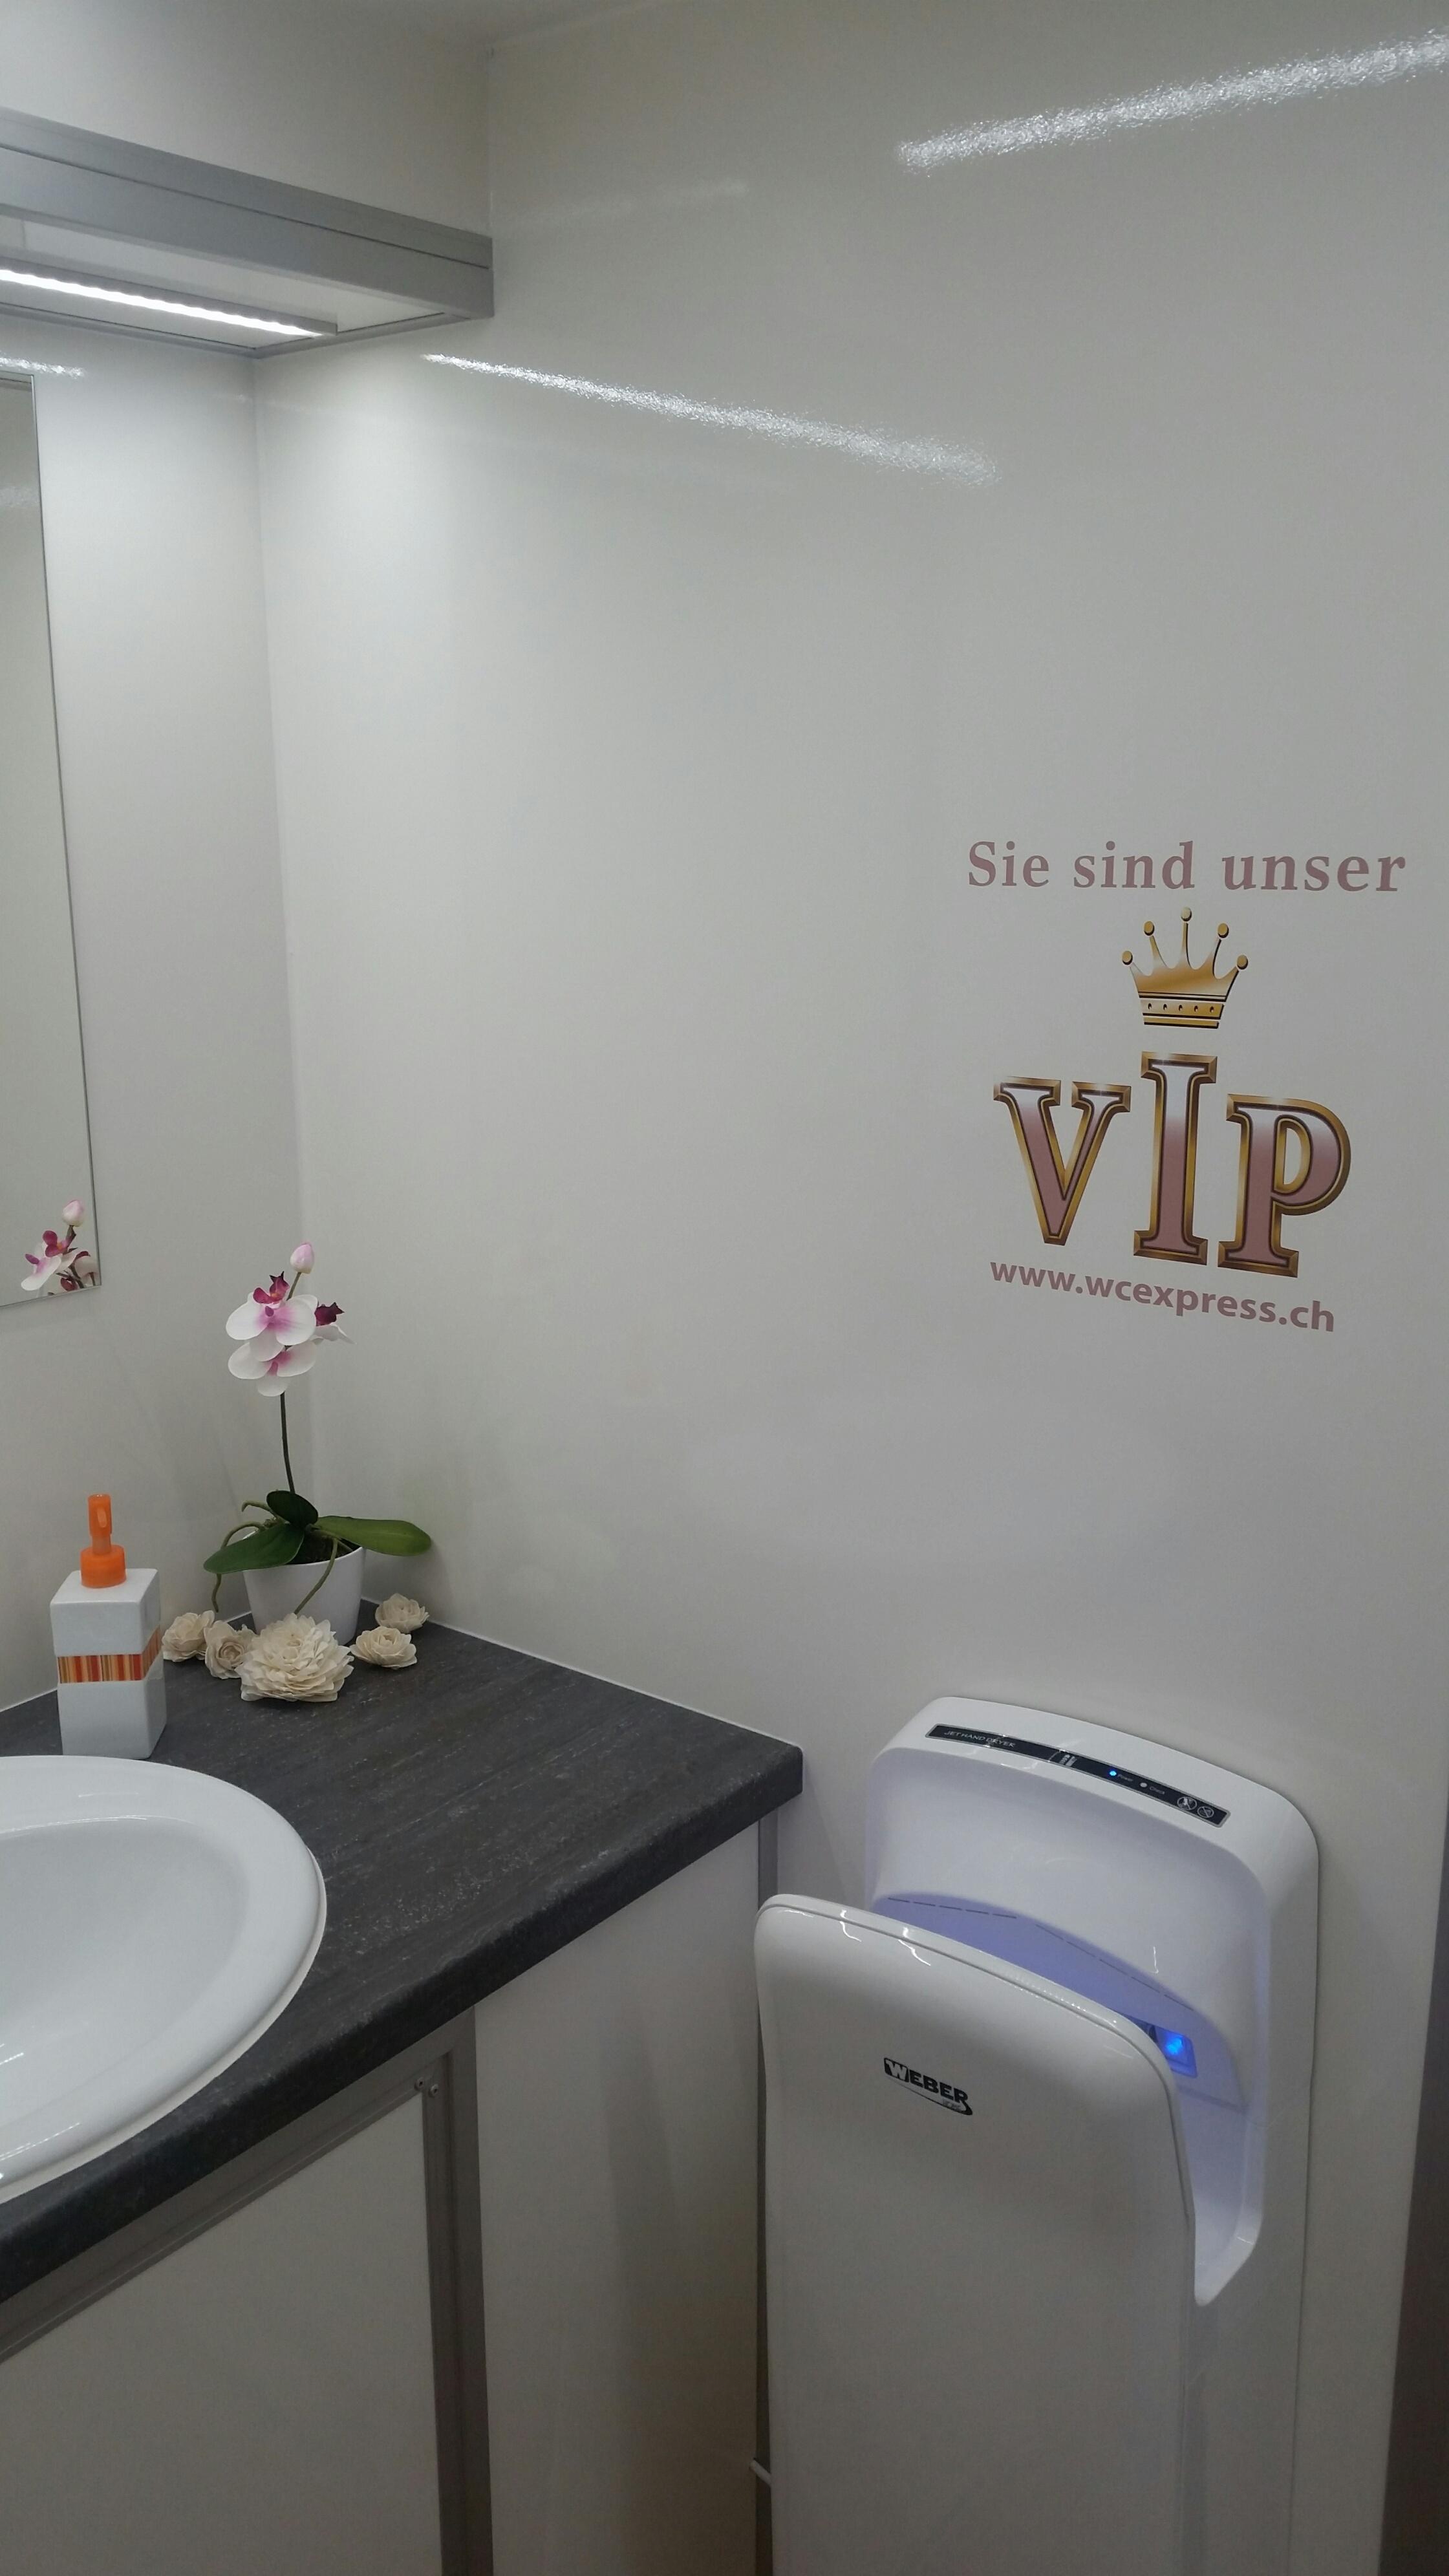 VIP WC-Wagen_Juni 2016_2